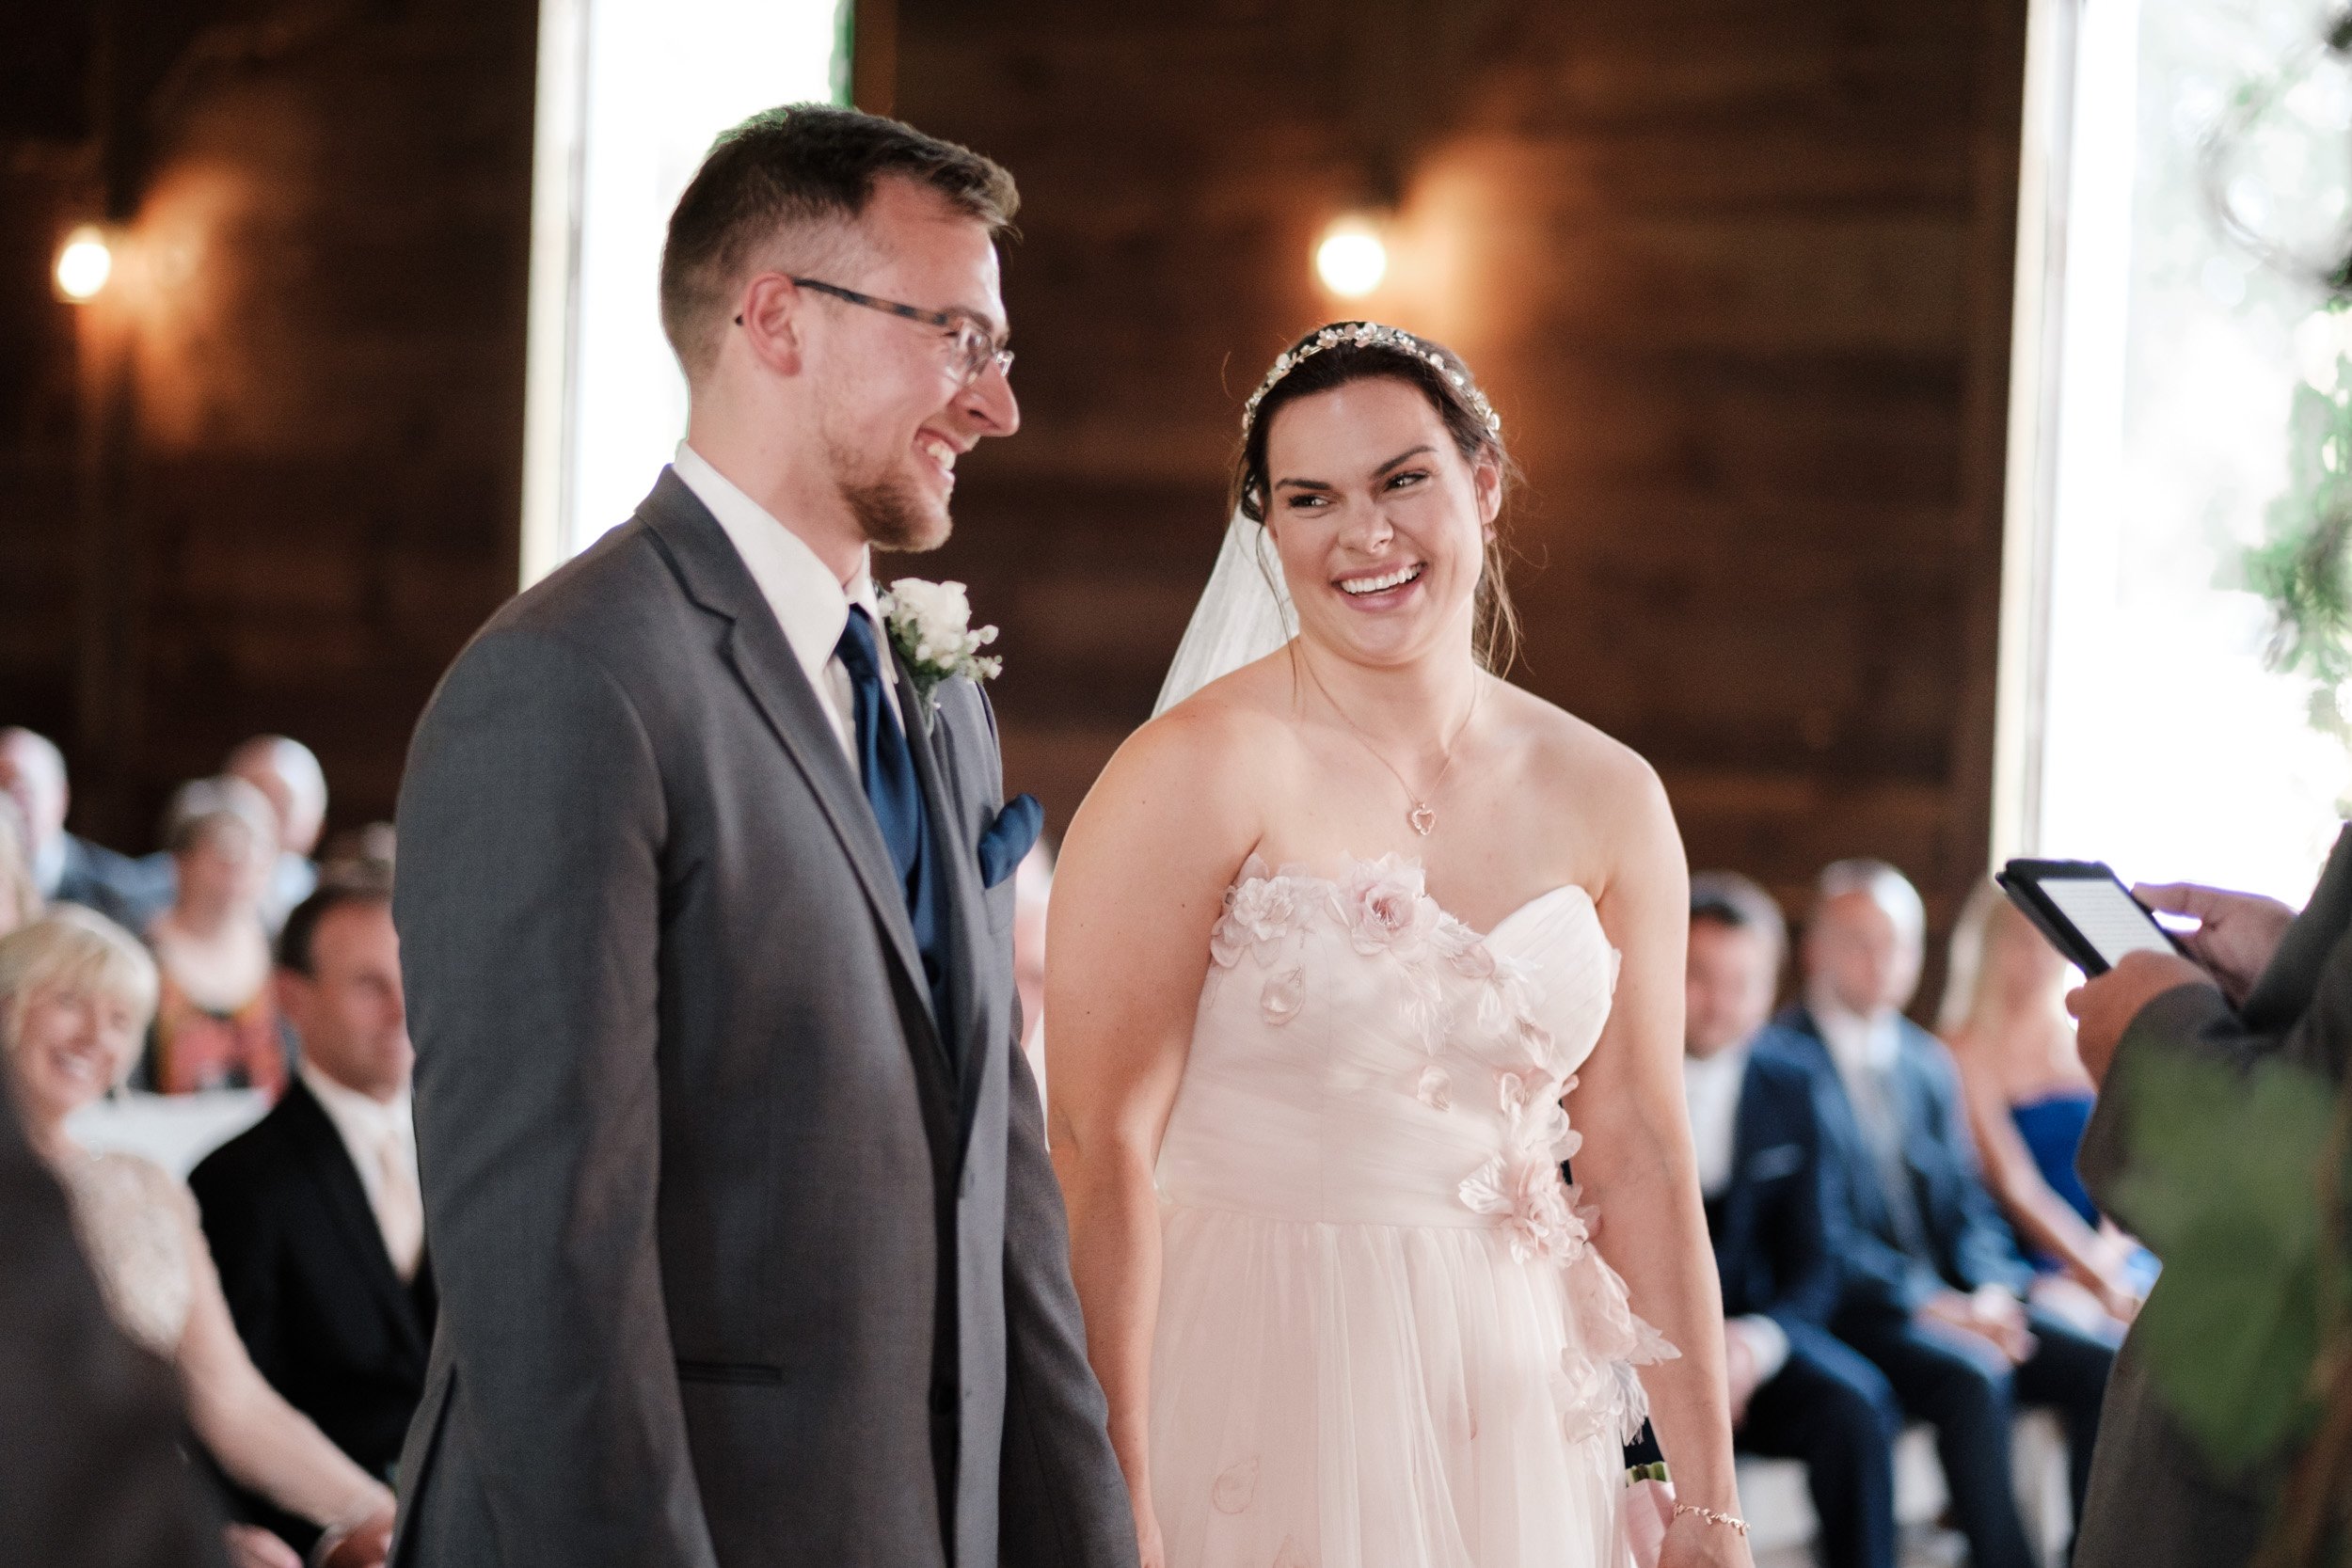 19-06-22-Ryan-Katie-The-Fields-Reserve-Wedding-29.jpg